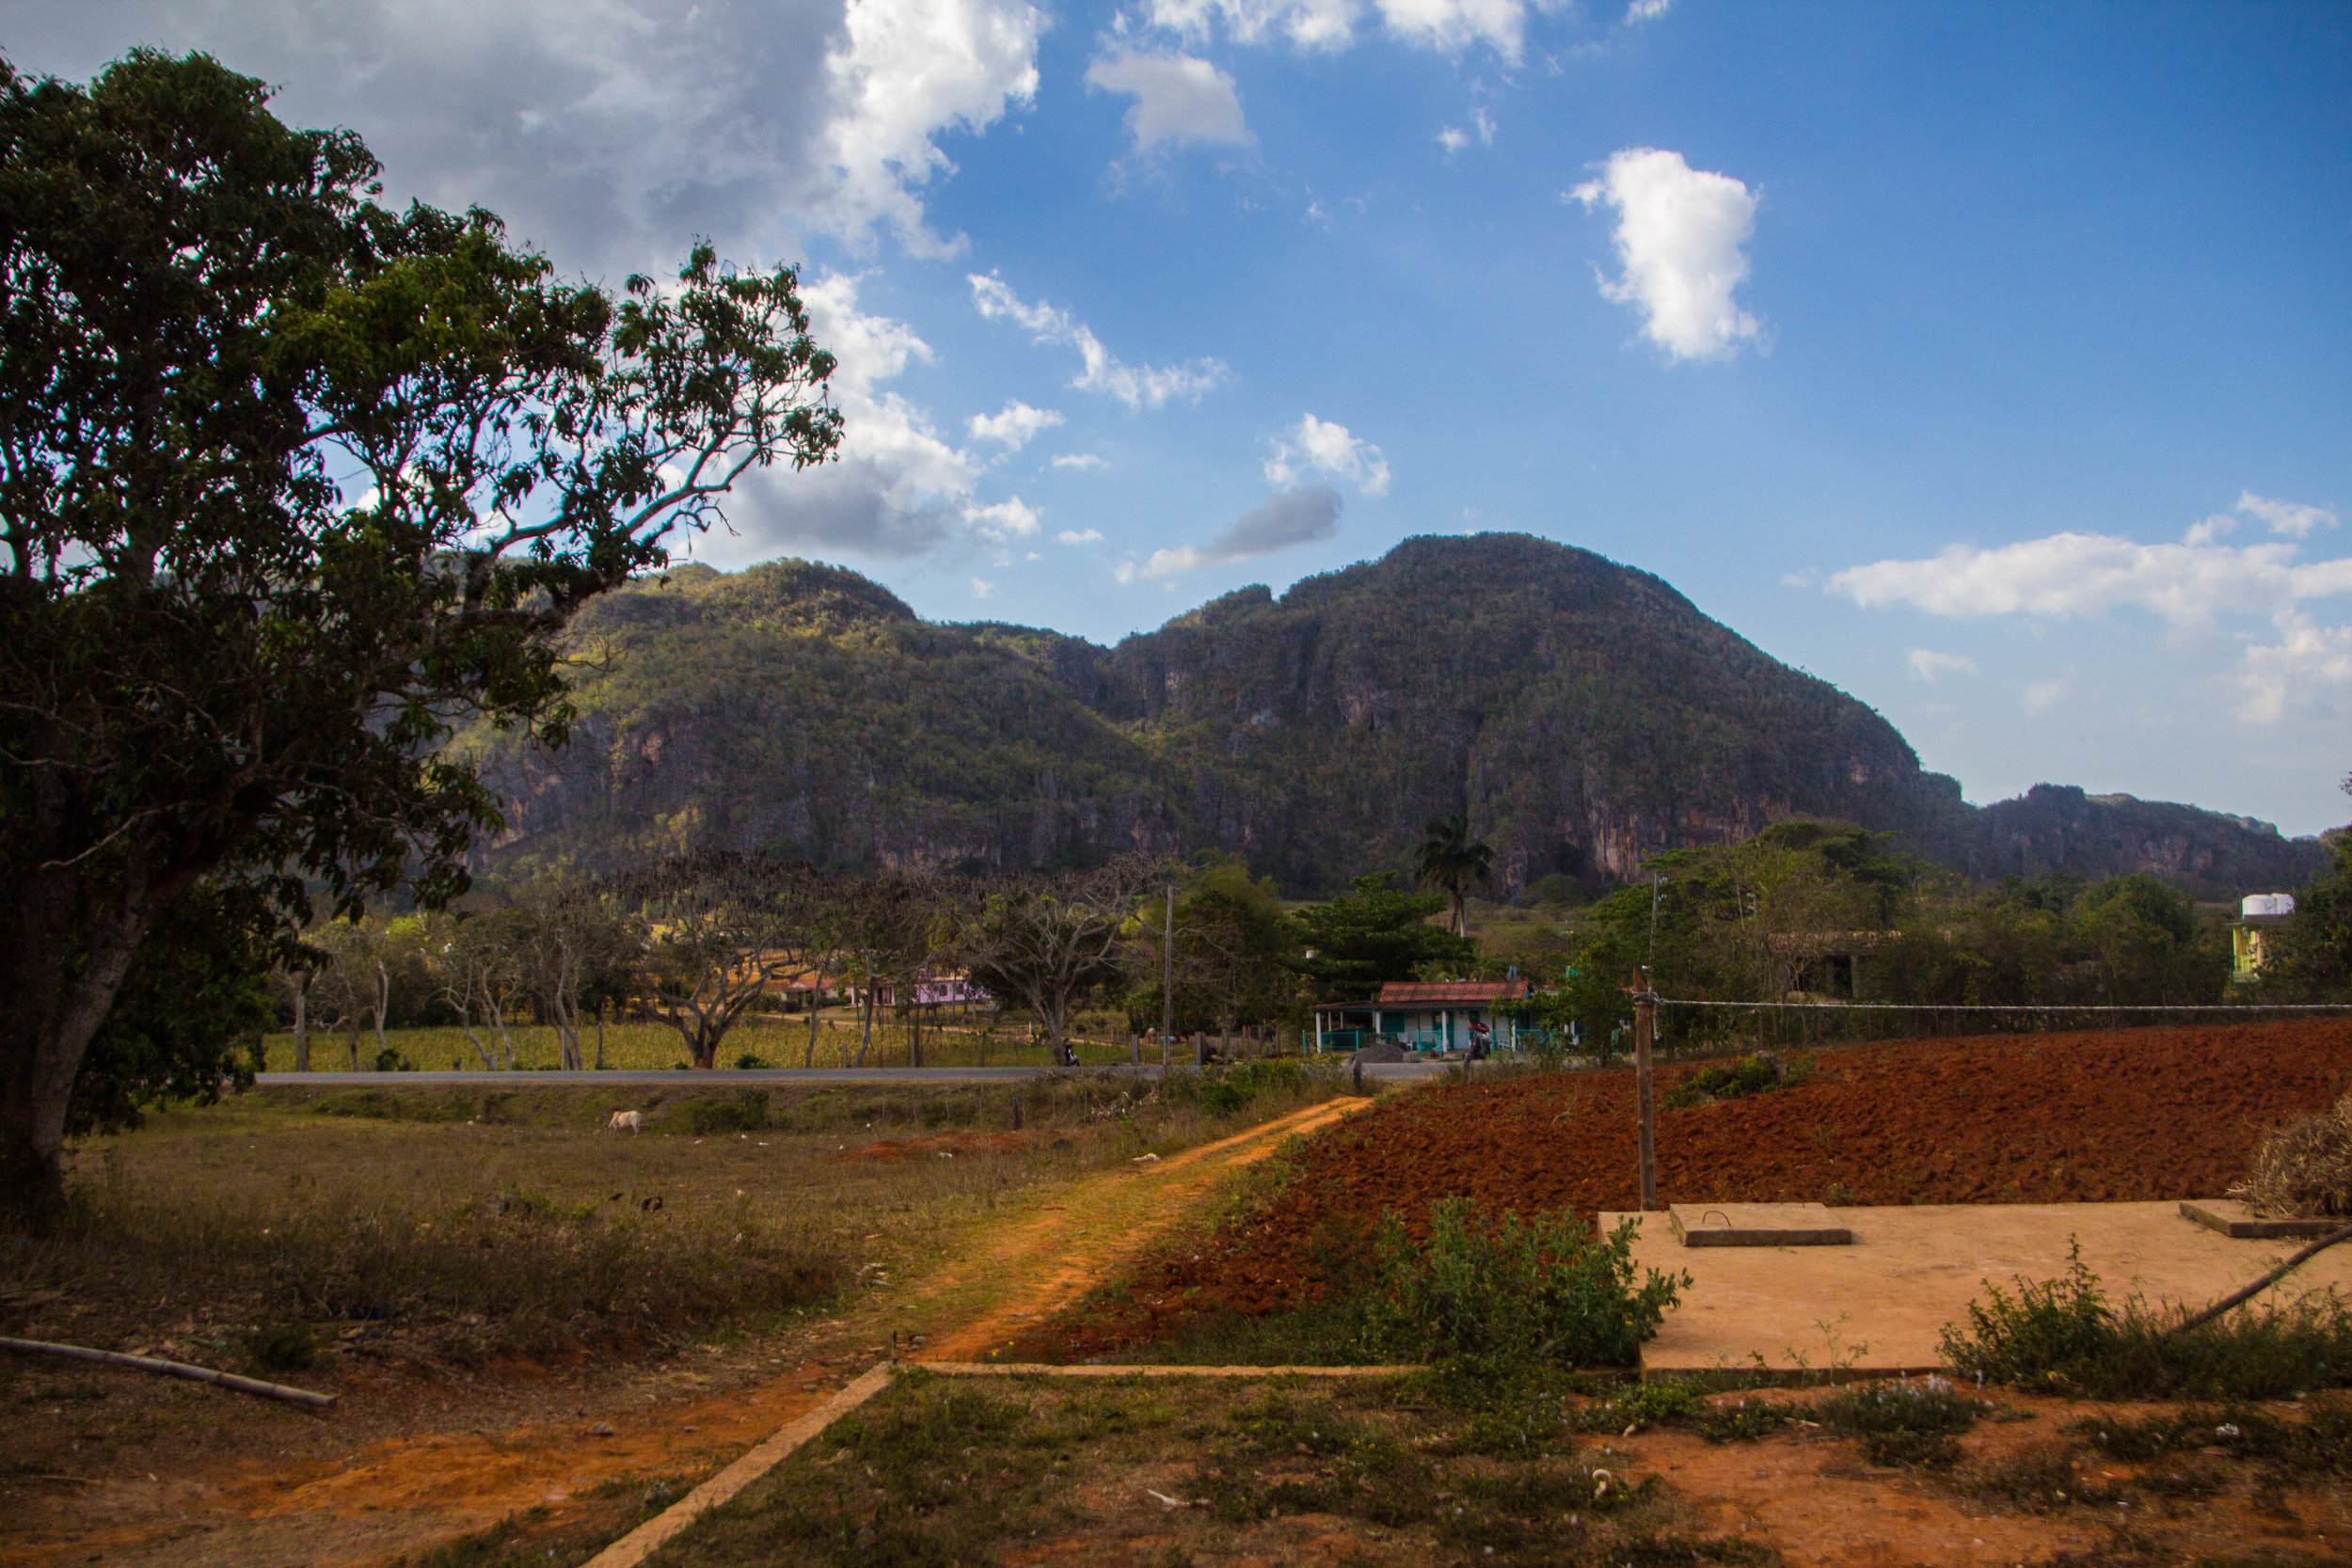 roads mountains viñales cuba-1-2-2.jpg